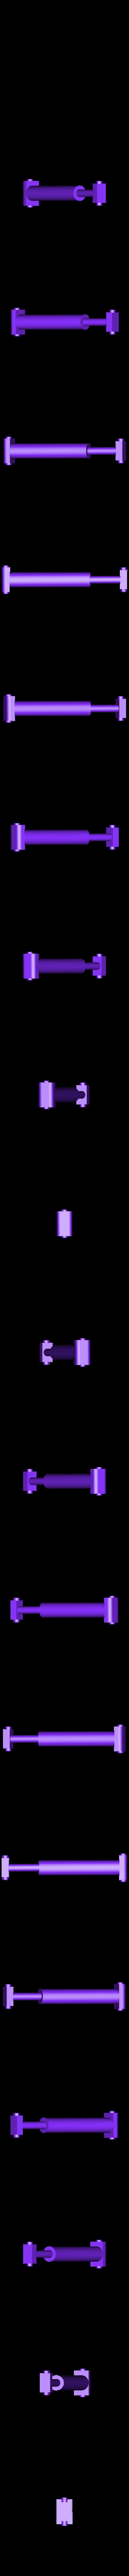 G verin bras1.STL Download STL file Draisine Matisa for LGB • 3D printable object, biddle